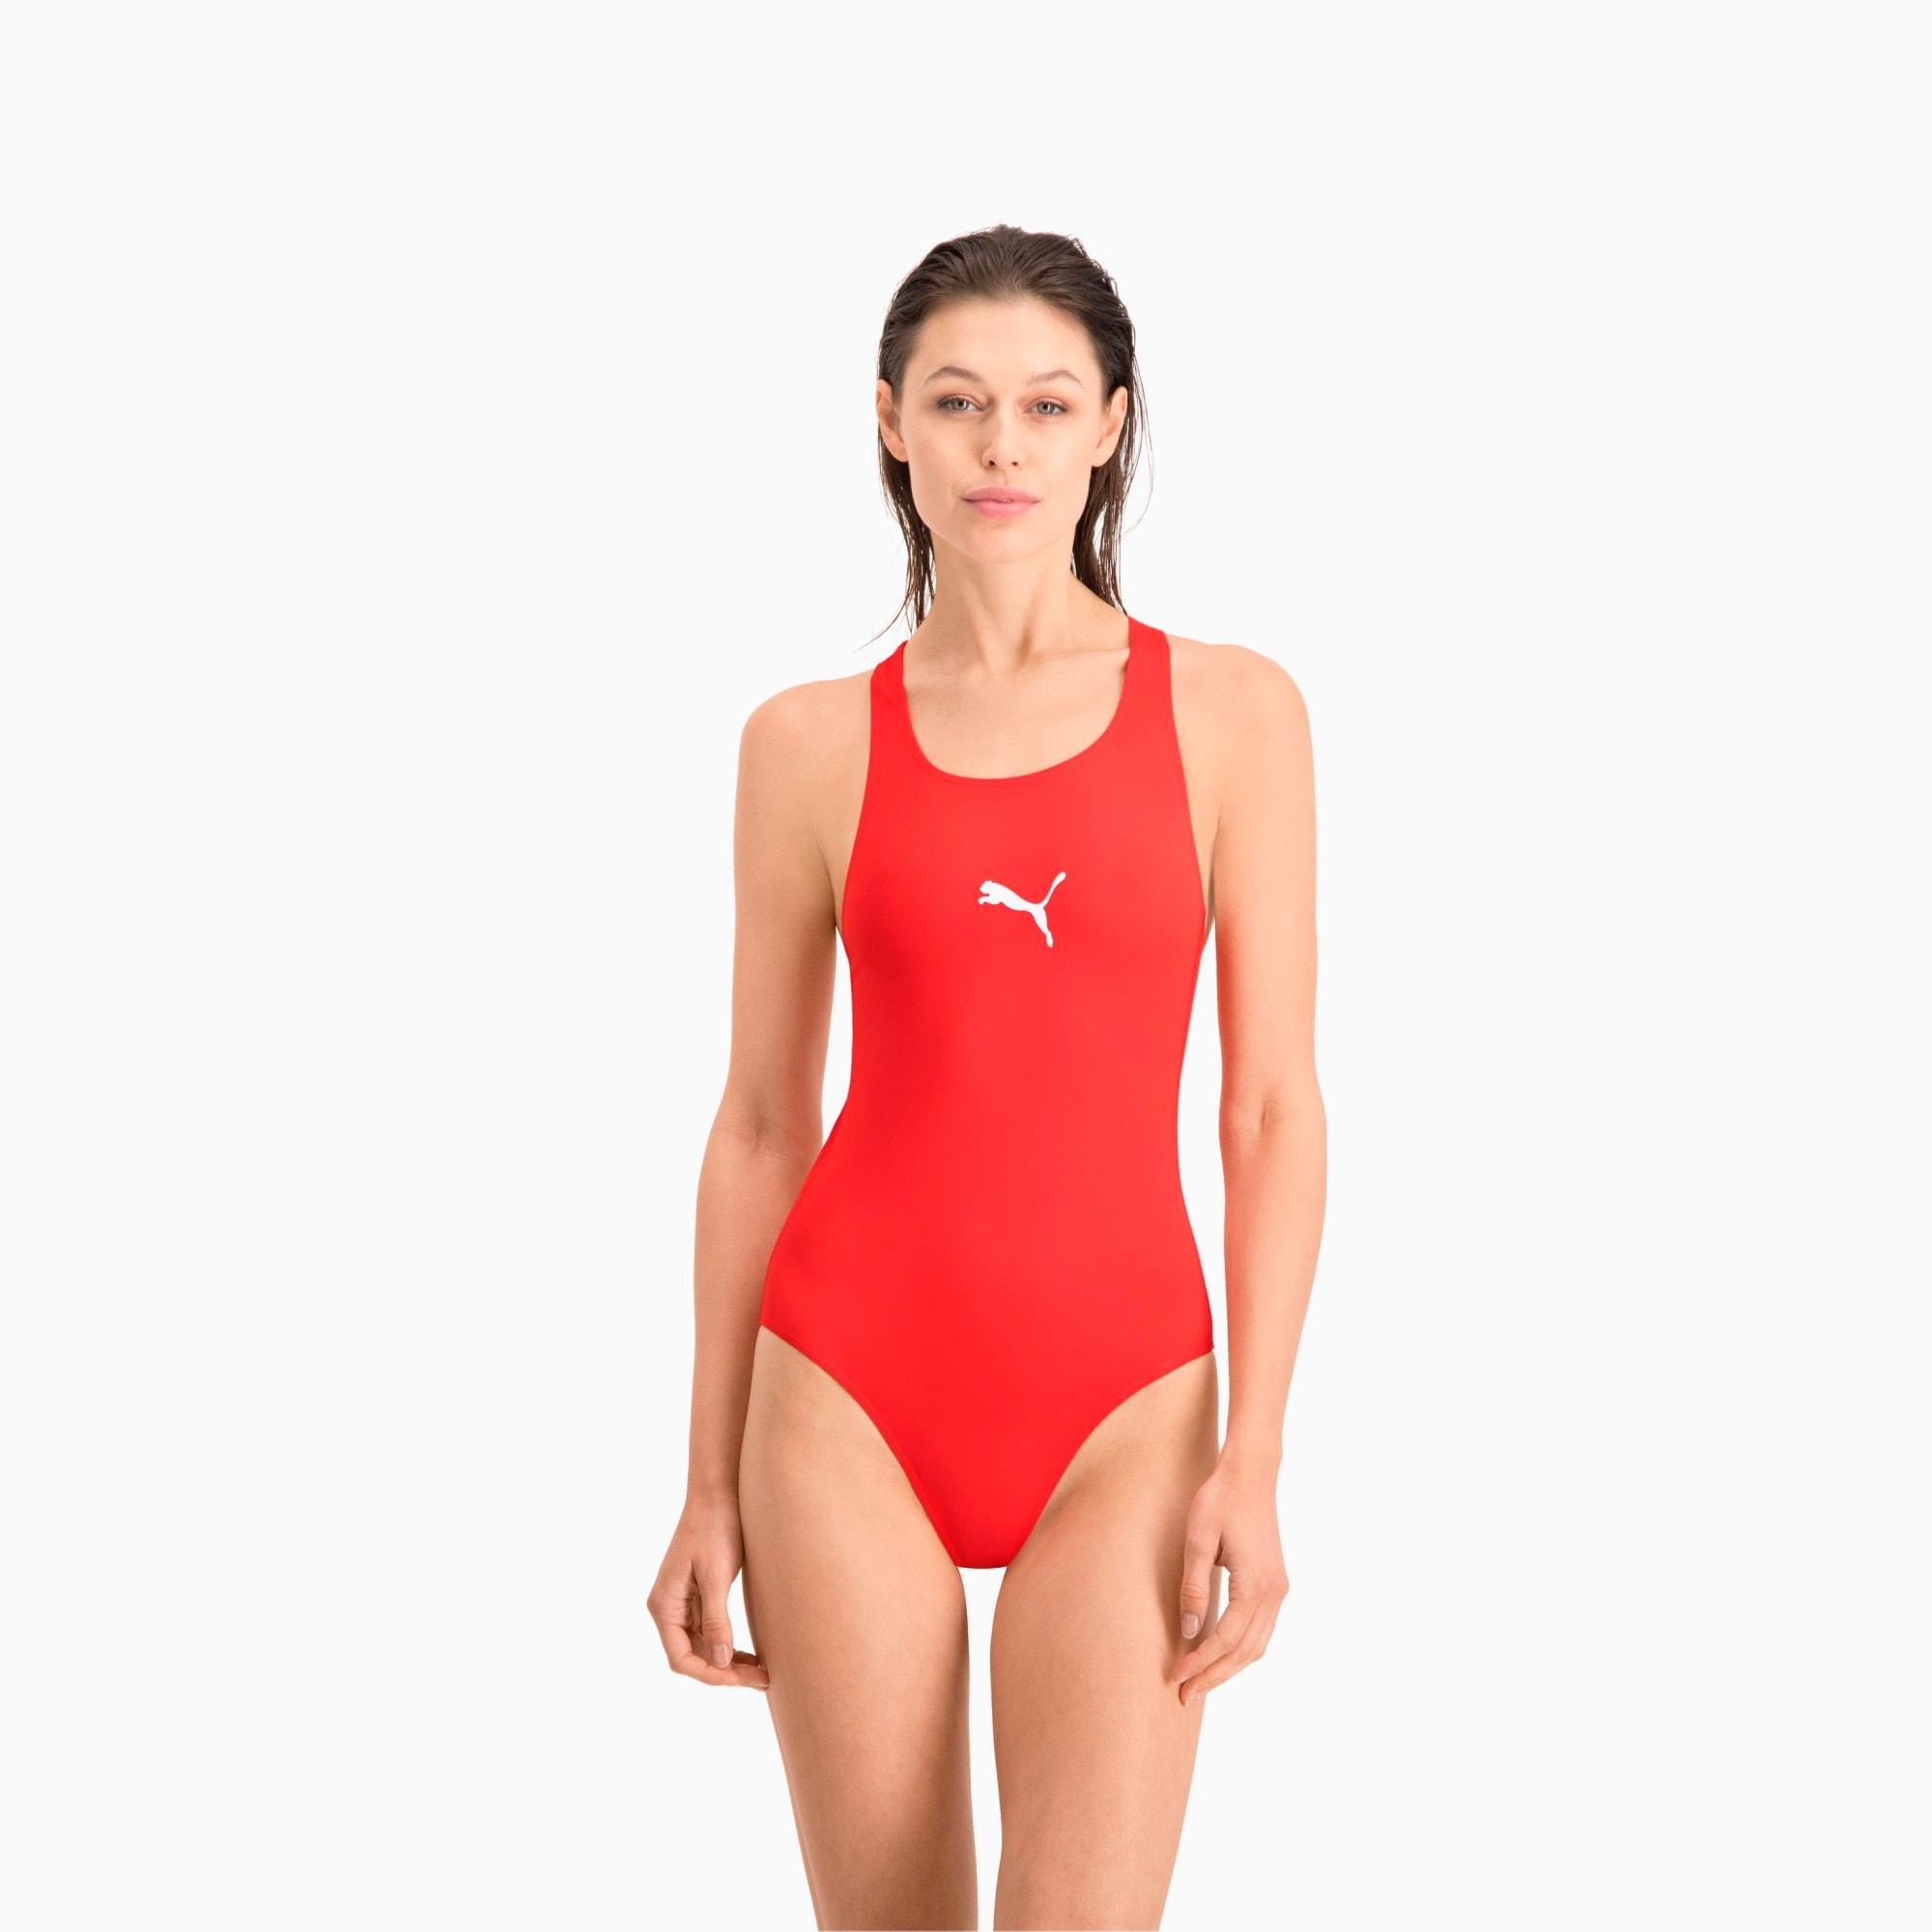 PUMA Swim Women's Racerback Swimsuit